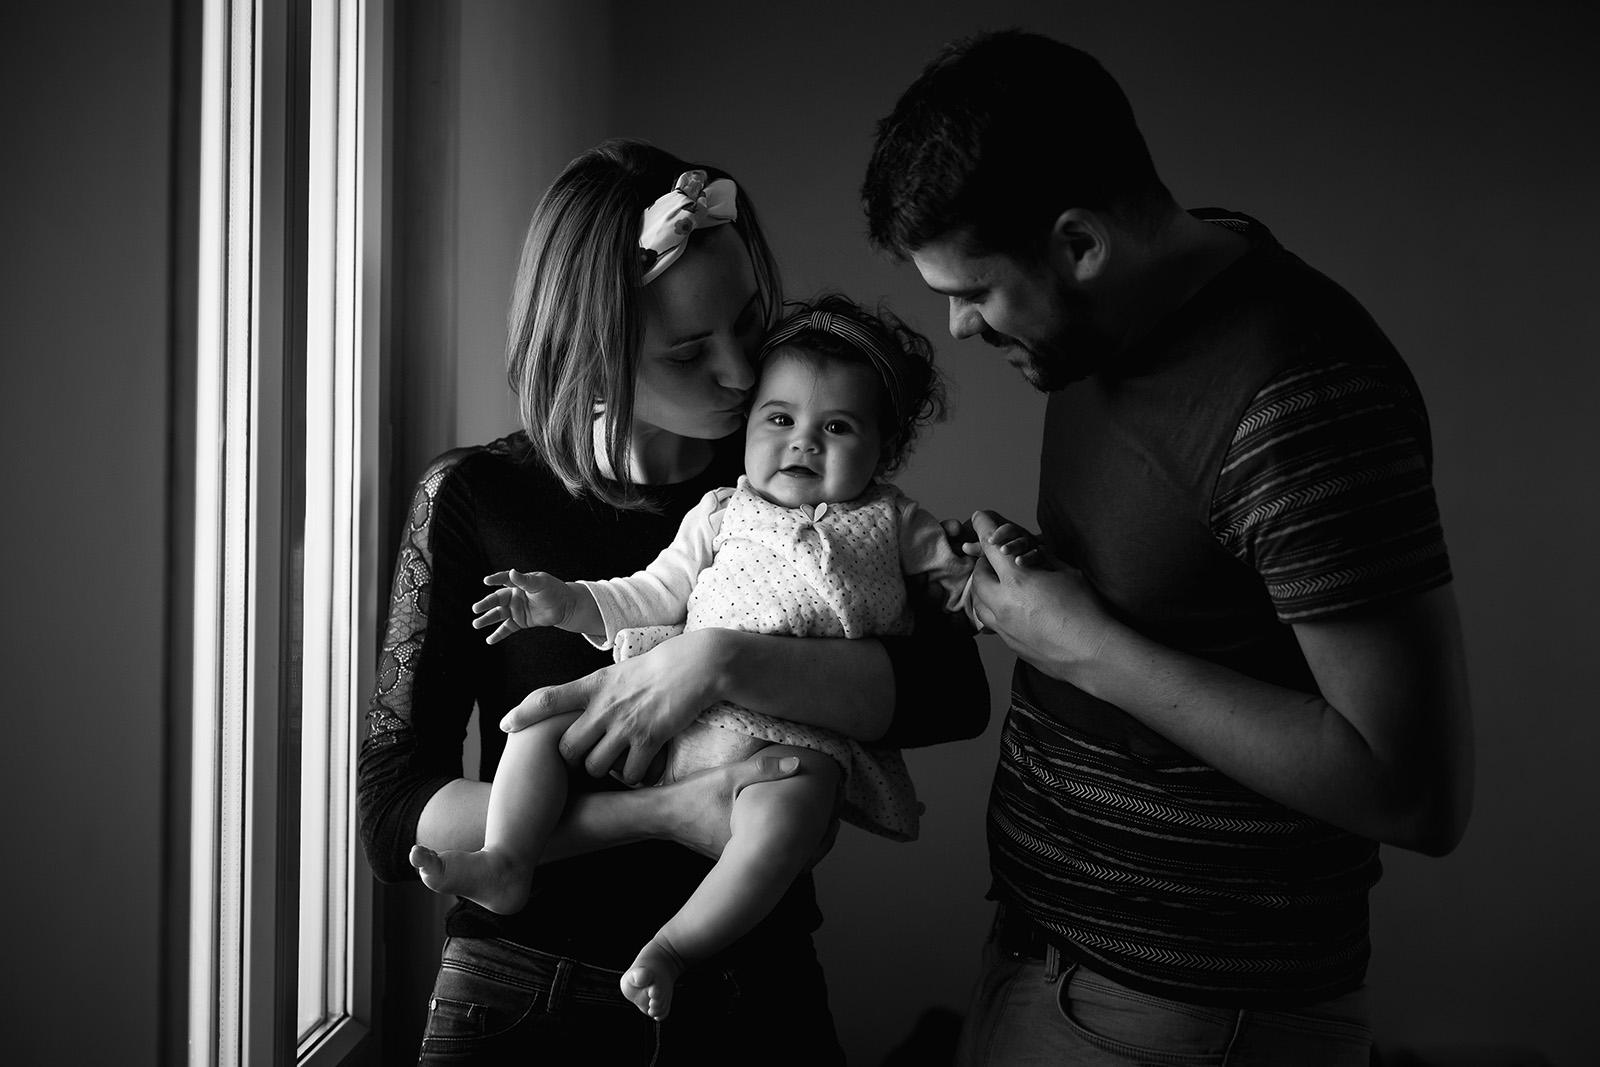 seance-photo-famille-bebe-enfant-maternite-elise-julliard-photographe-lyon-auvergne-rhone-alpes-ain-portrait-couple